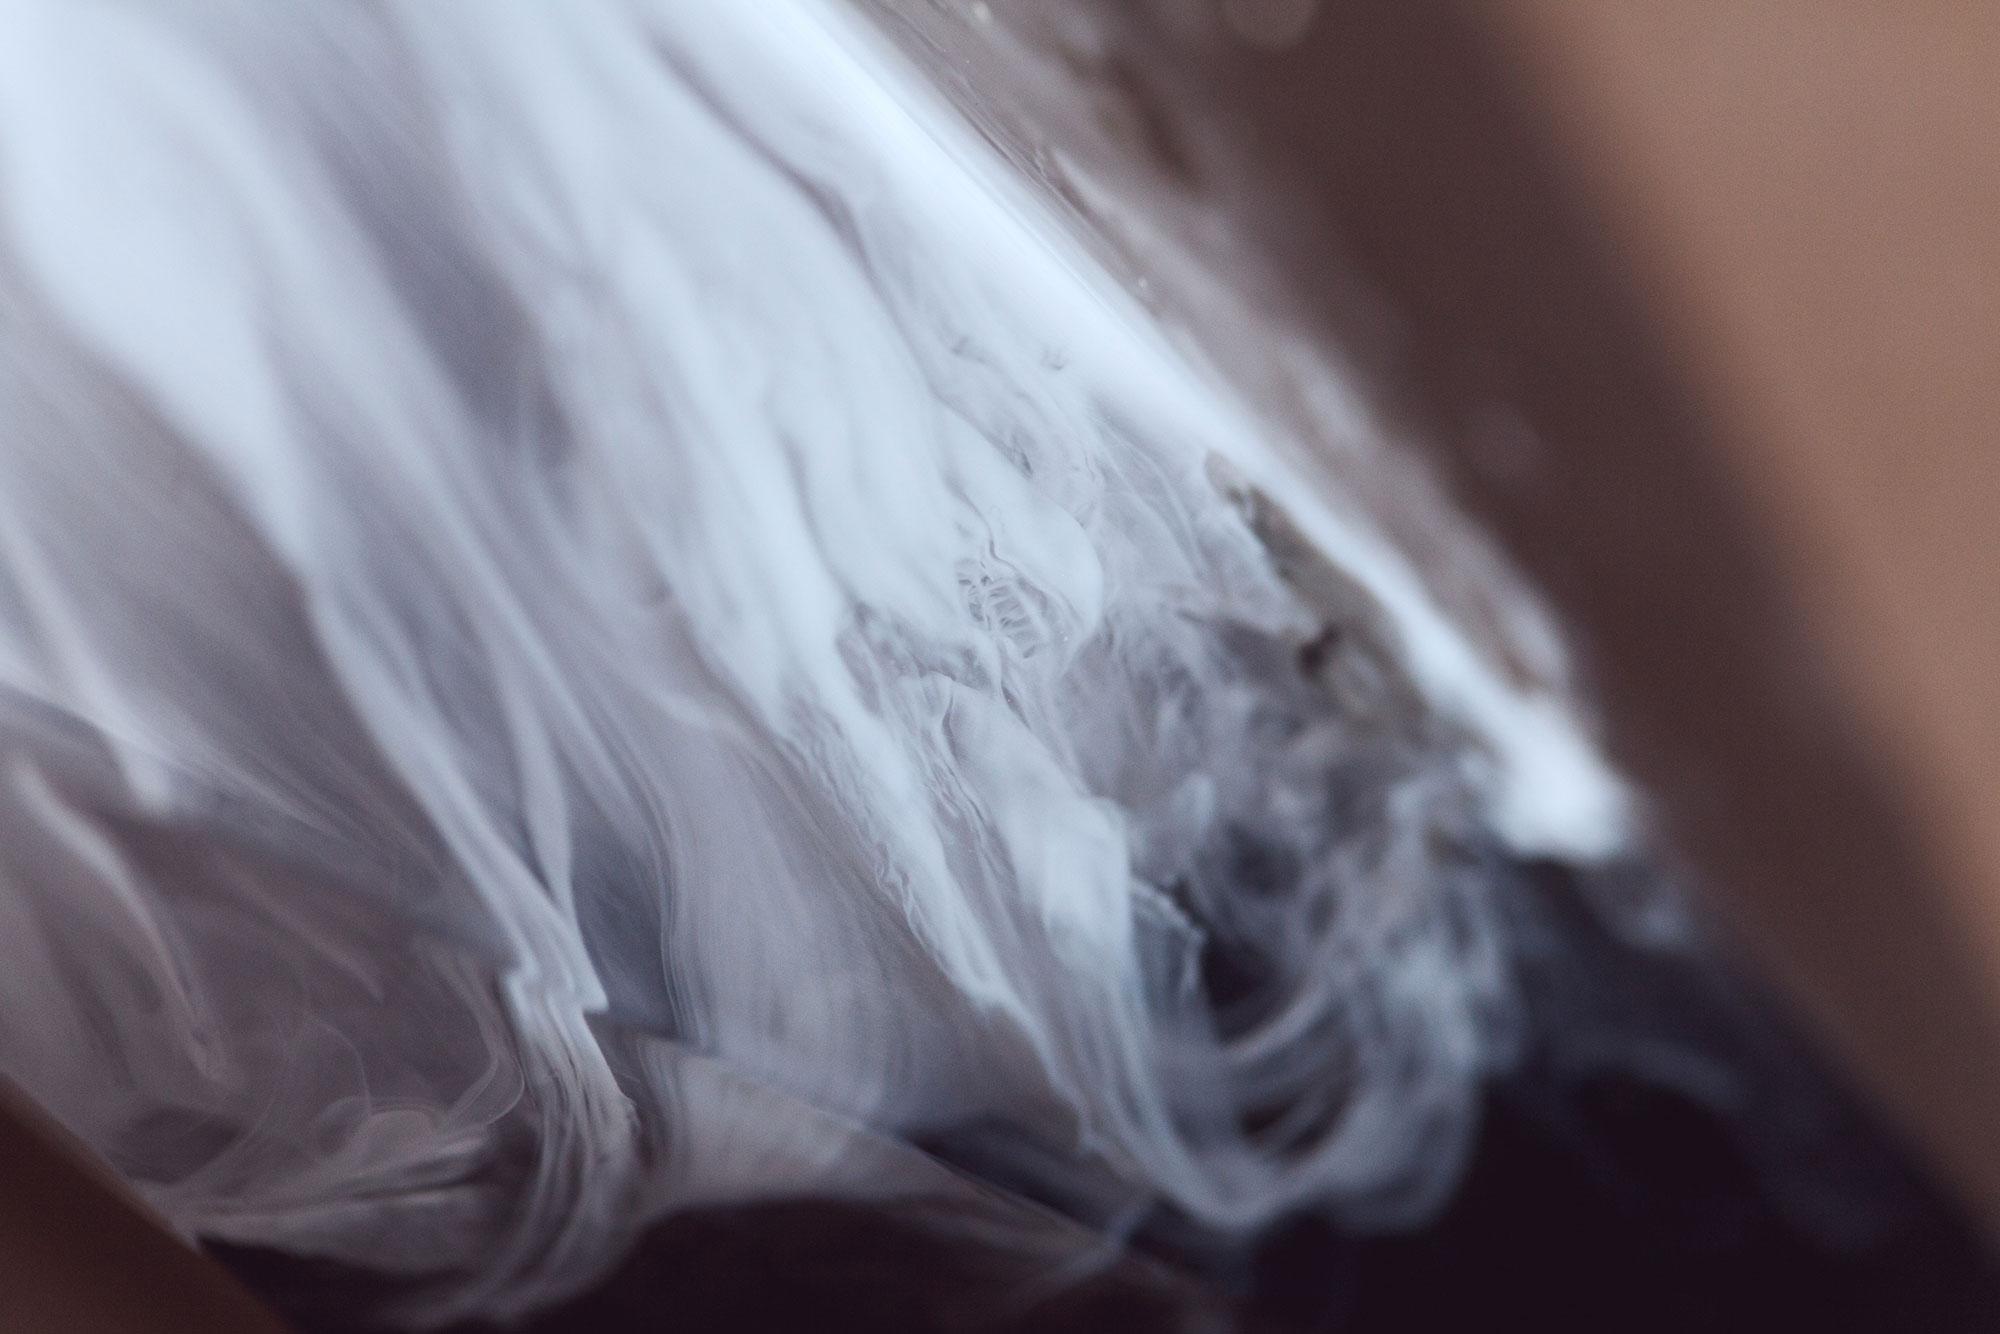 Lichens integrated with Jesmonite